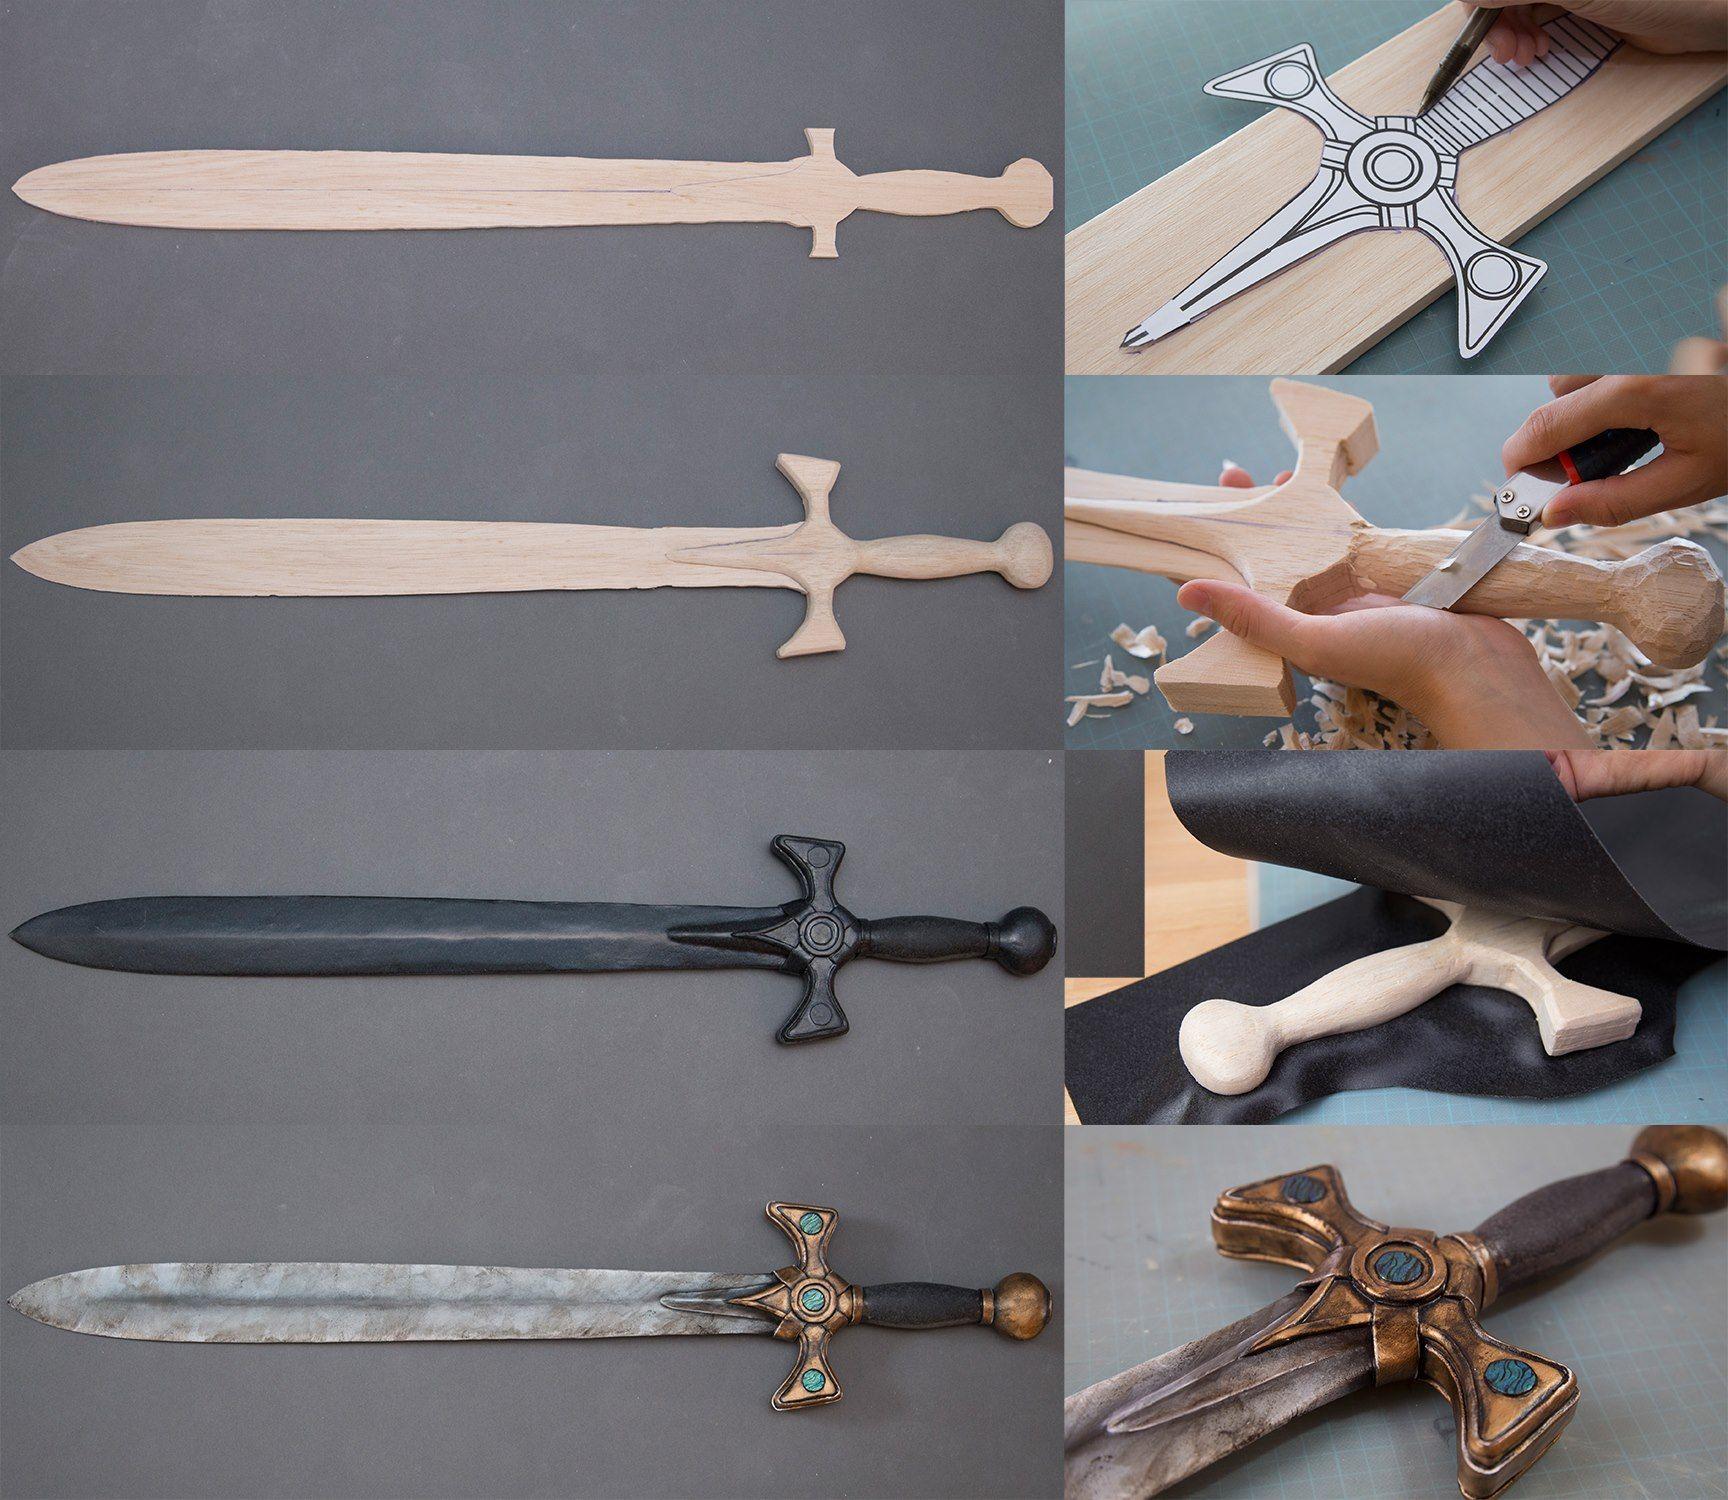 Xena Sword Kamui Cosplay Costuming Pinterest